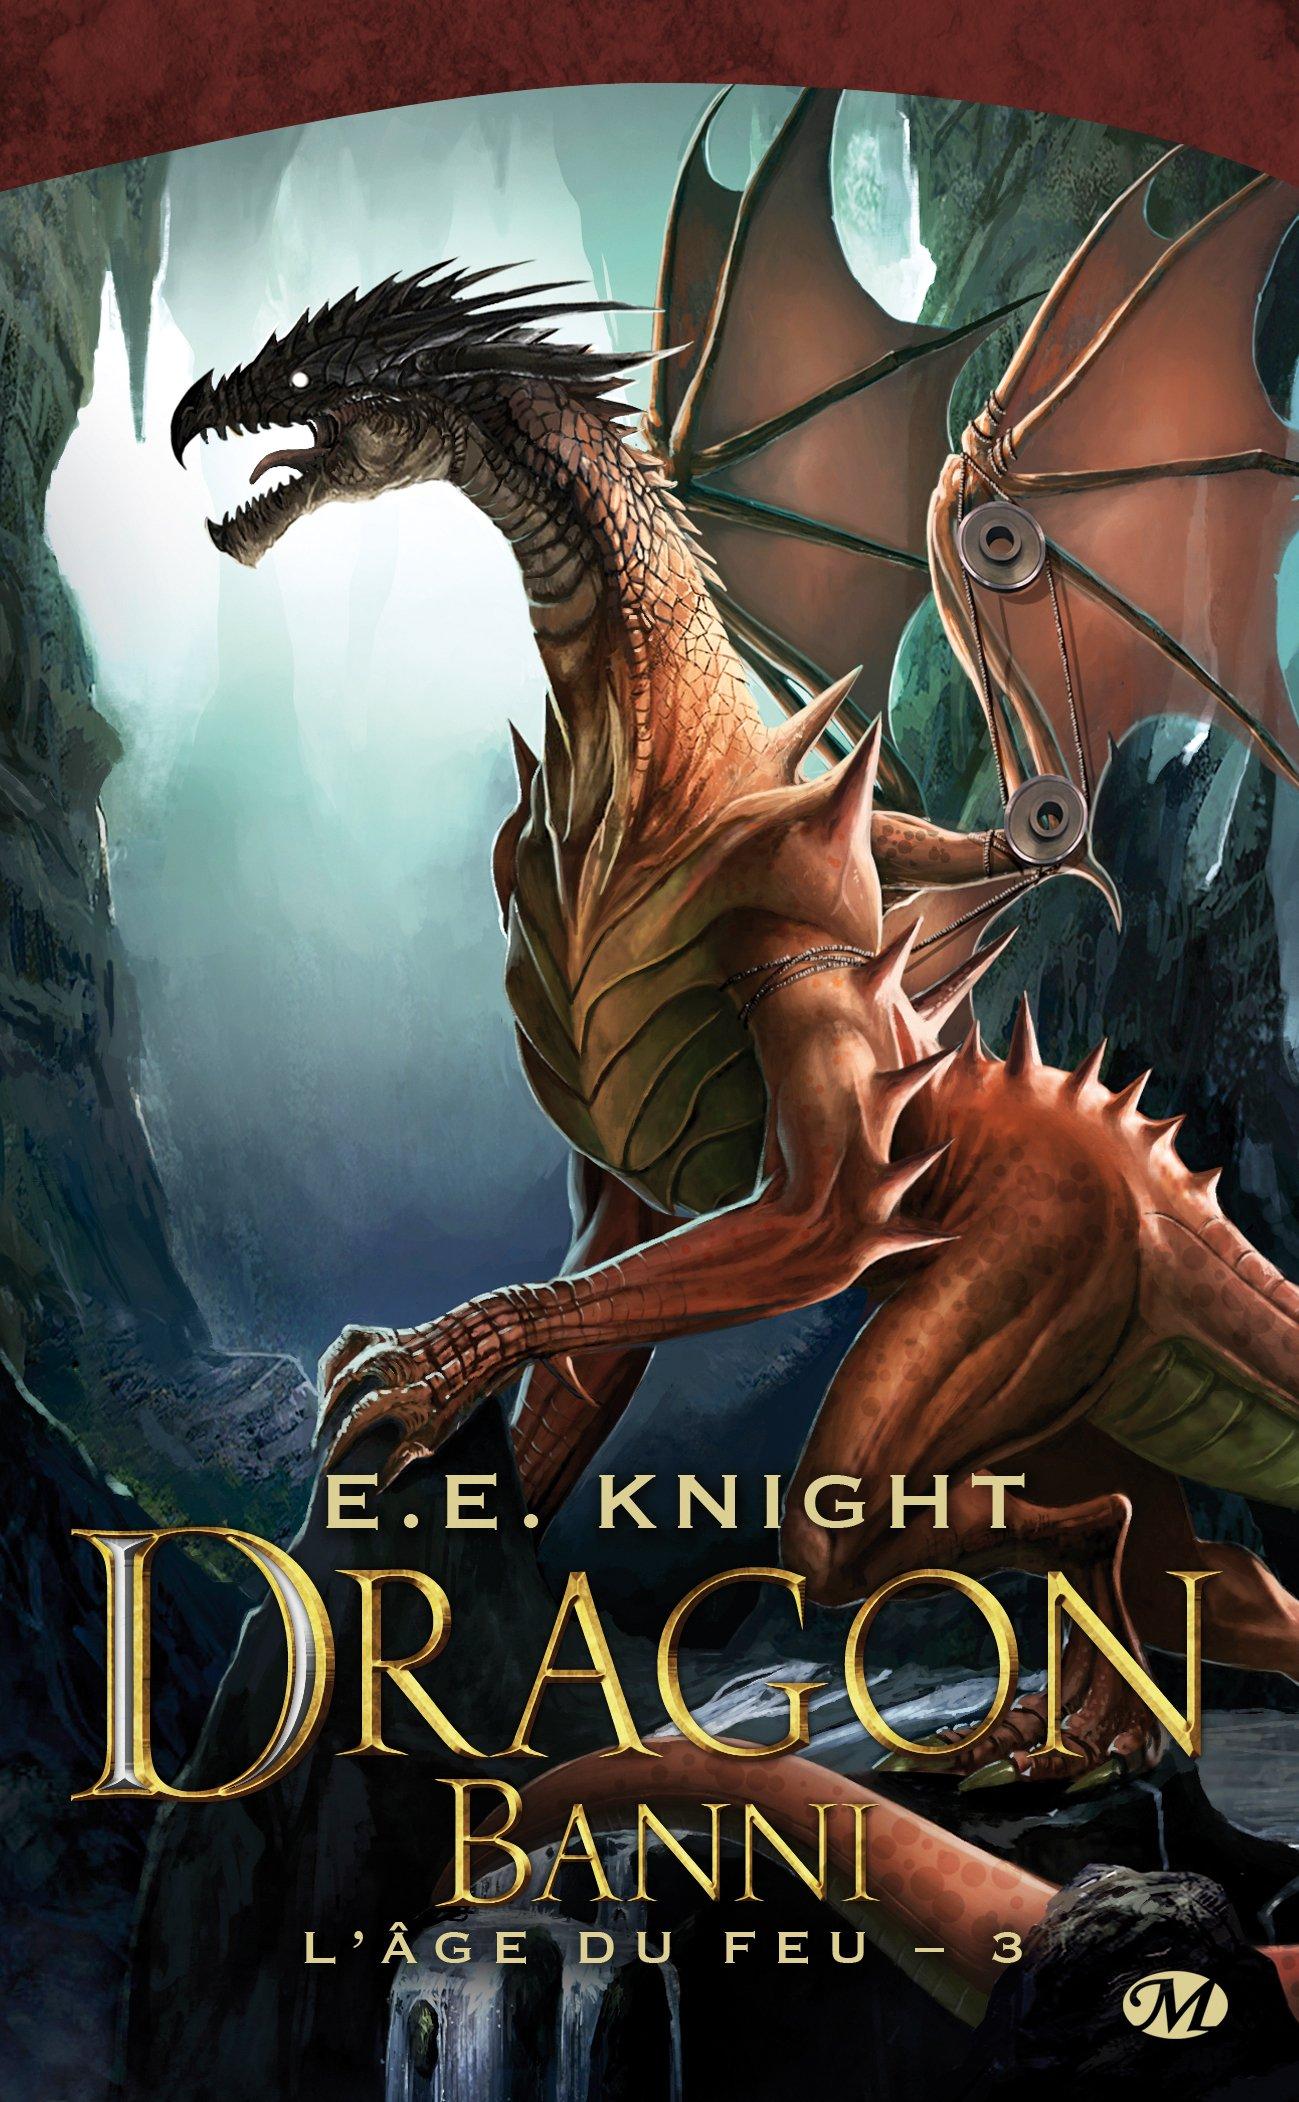 L'Âge du feu Tome 3 : Dragon Banni 81G-qPPhxZL